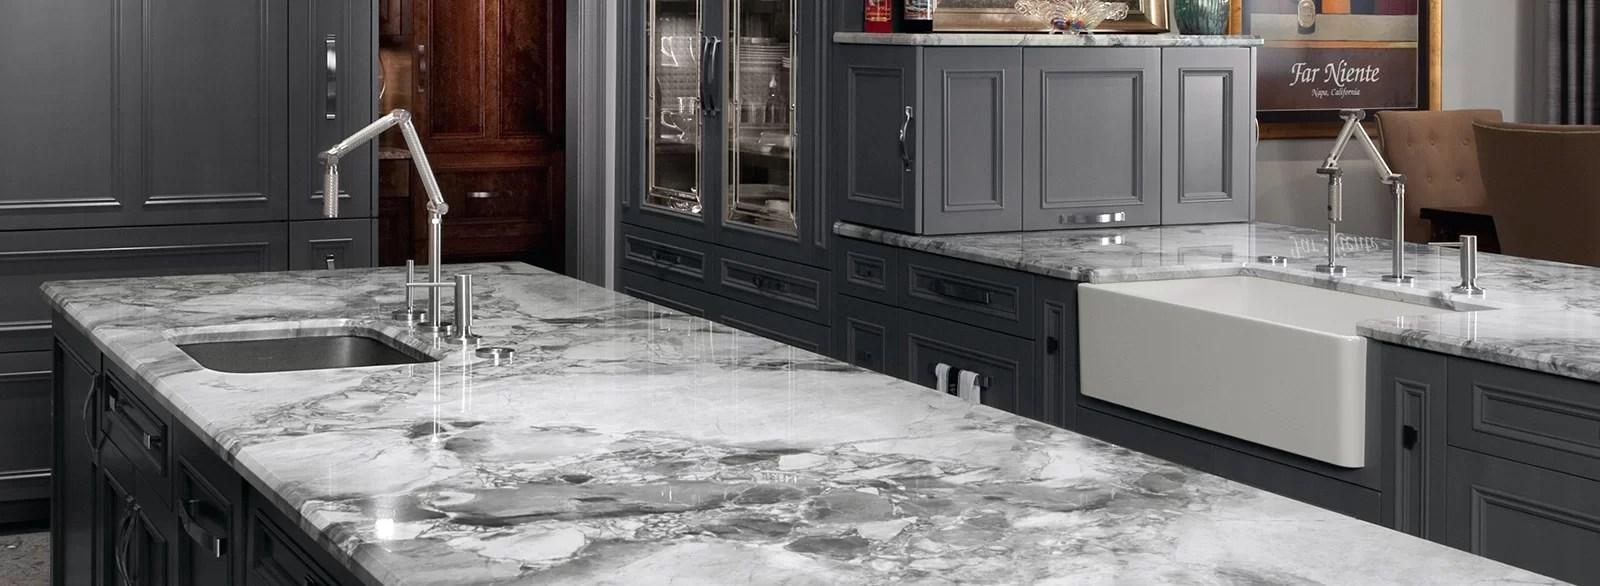 Planning to buy a kitchen countertop  Prefab Granite Depot